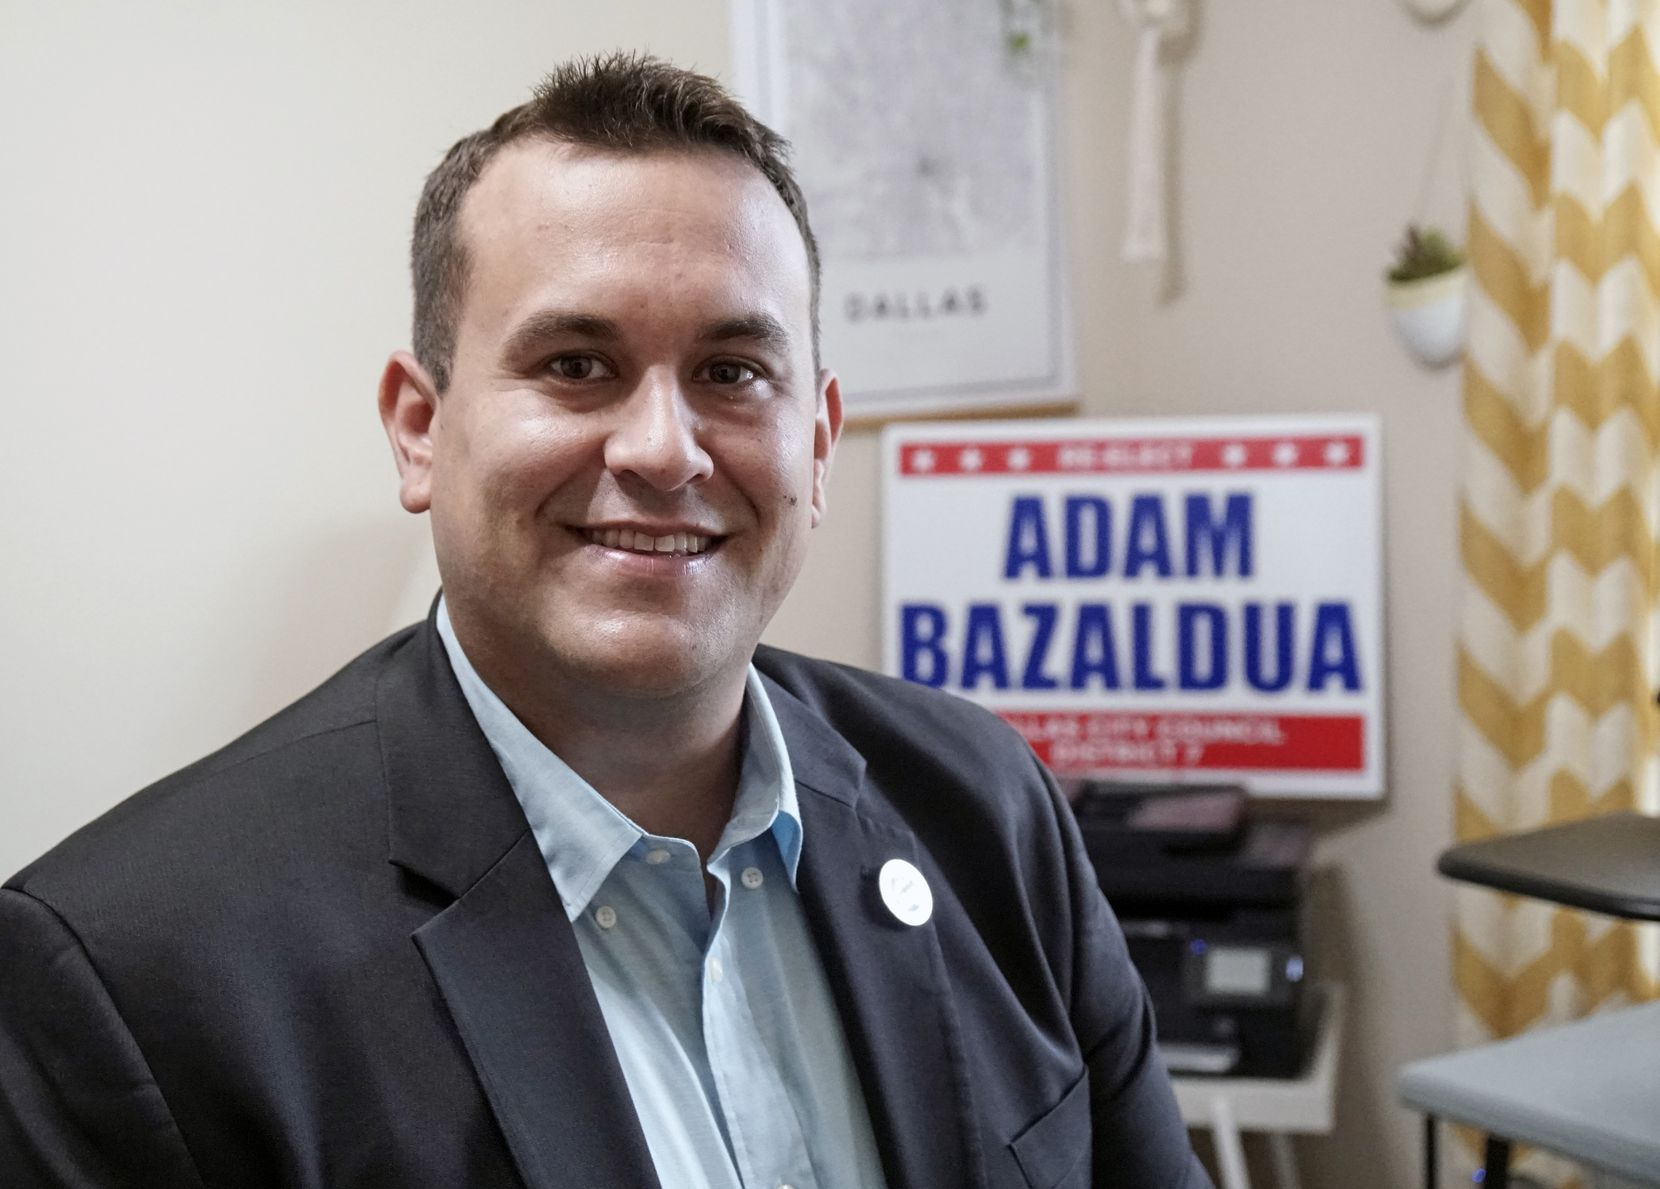 District 7 council member Adam Bazaldua at his home in Dallas on May 20, 2021.